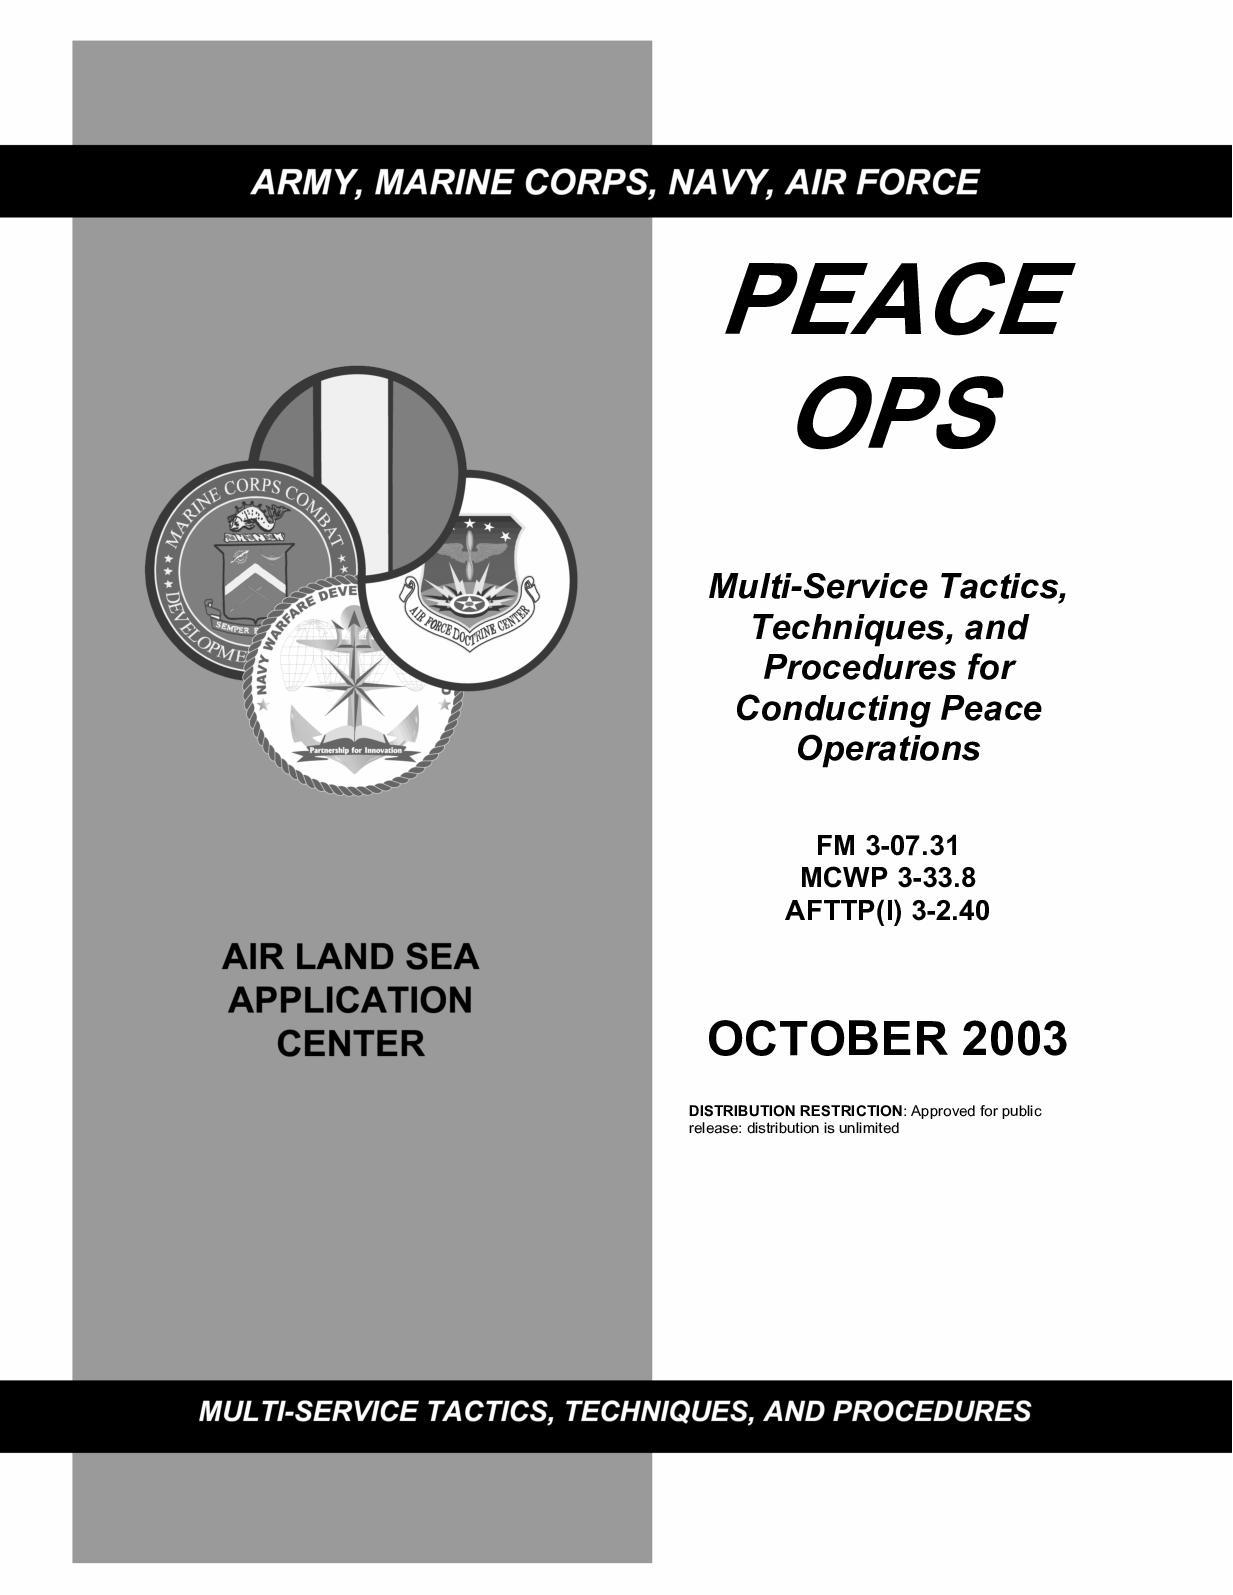 Calaméo - (e Book - English - Military) US Army - Field Manual FM 3